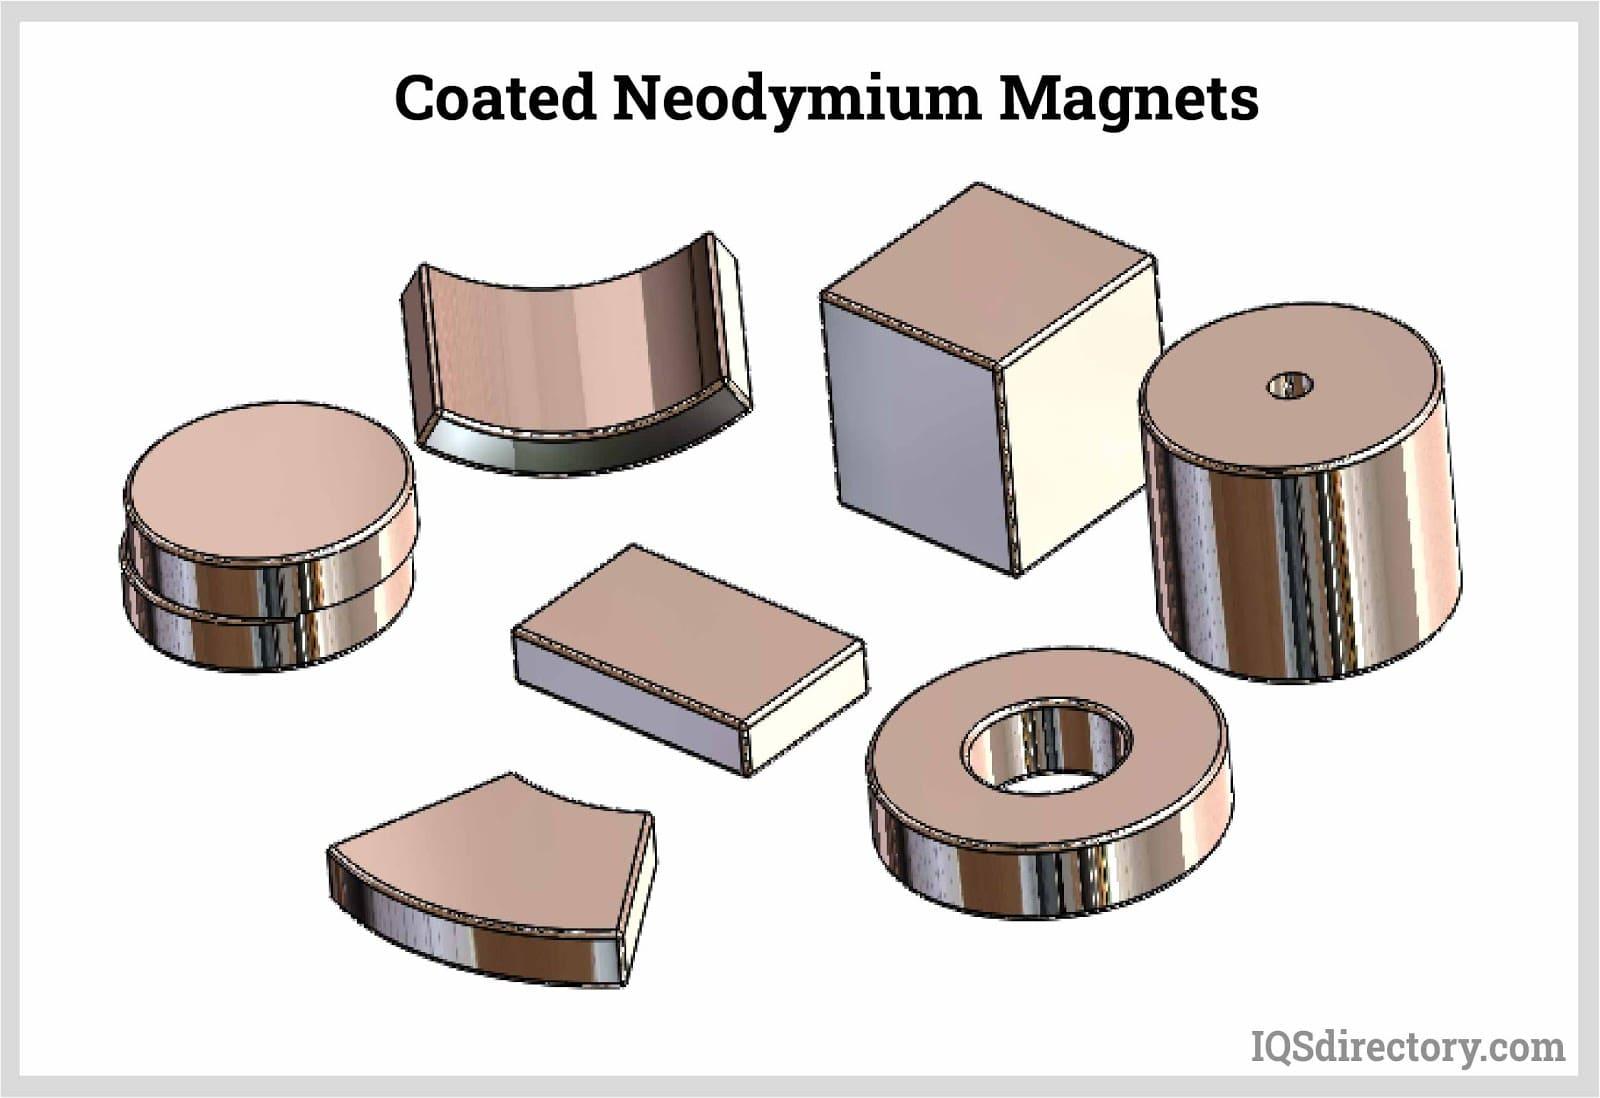 Coated Neodymium Magnets